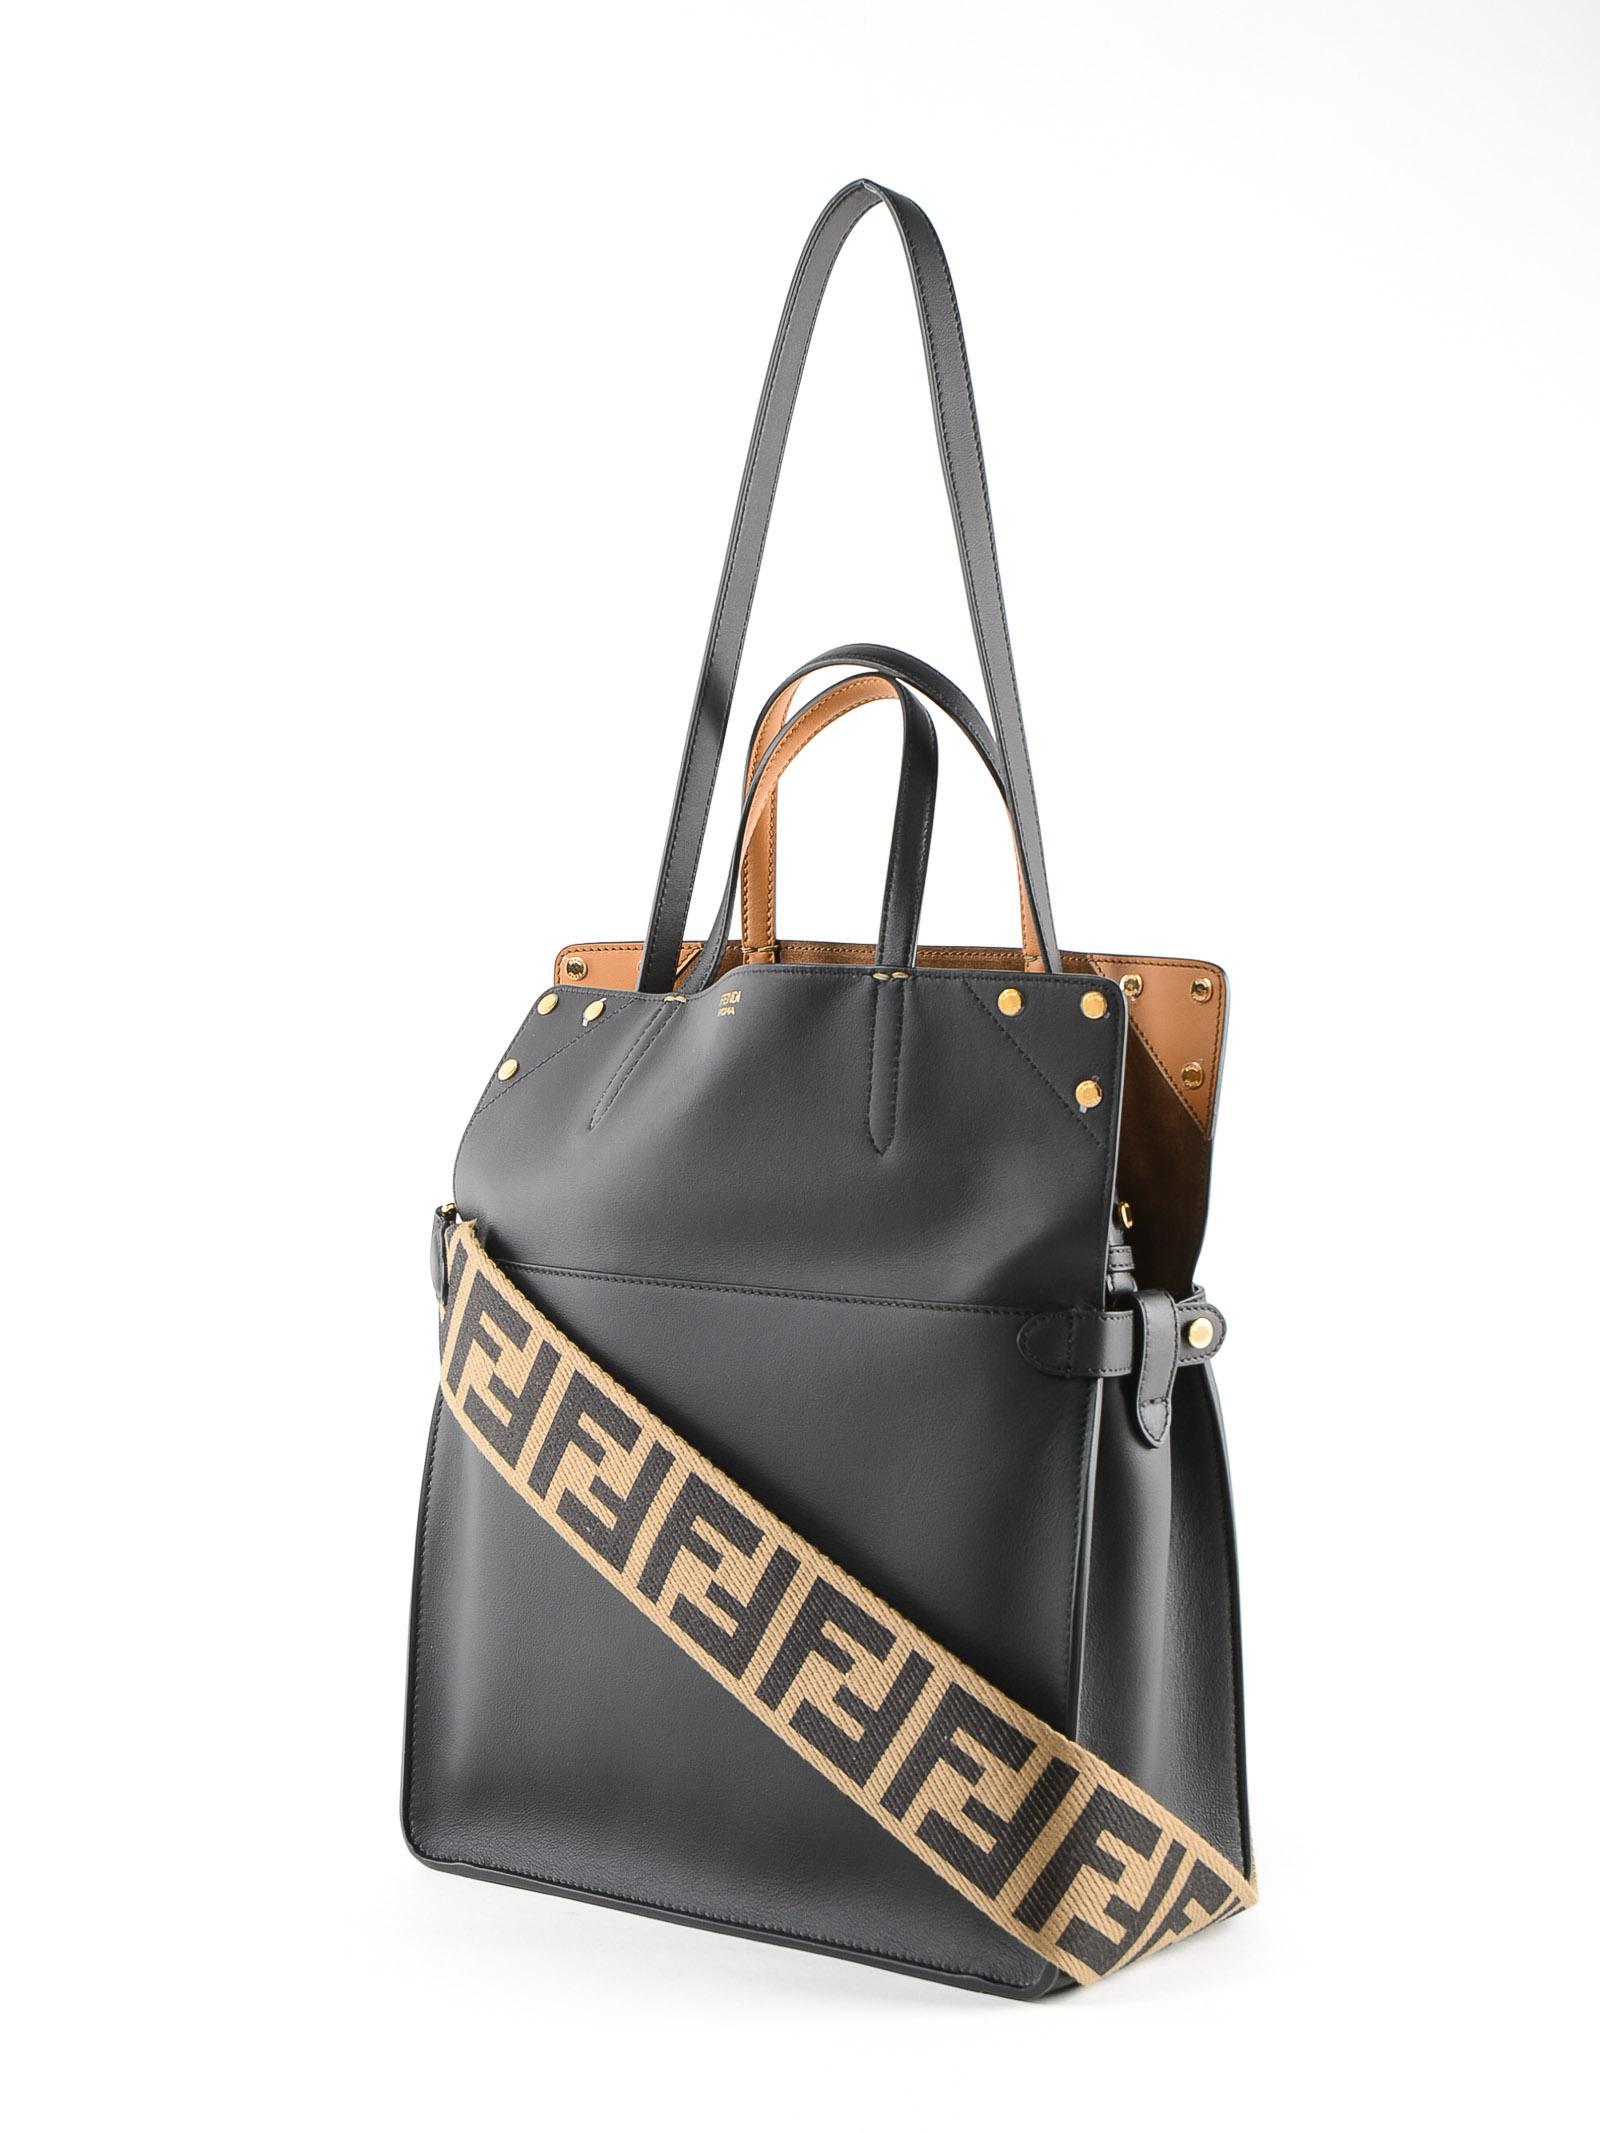 23ee3ad52e07 Lyst - Fendi Flip Regular Bag in Black